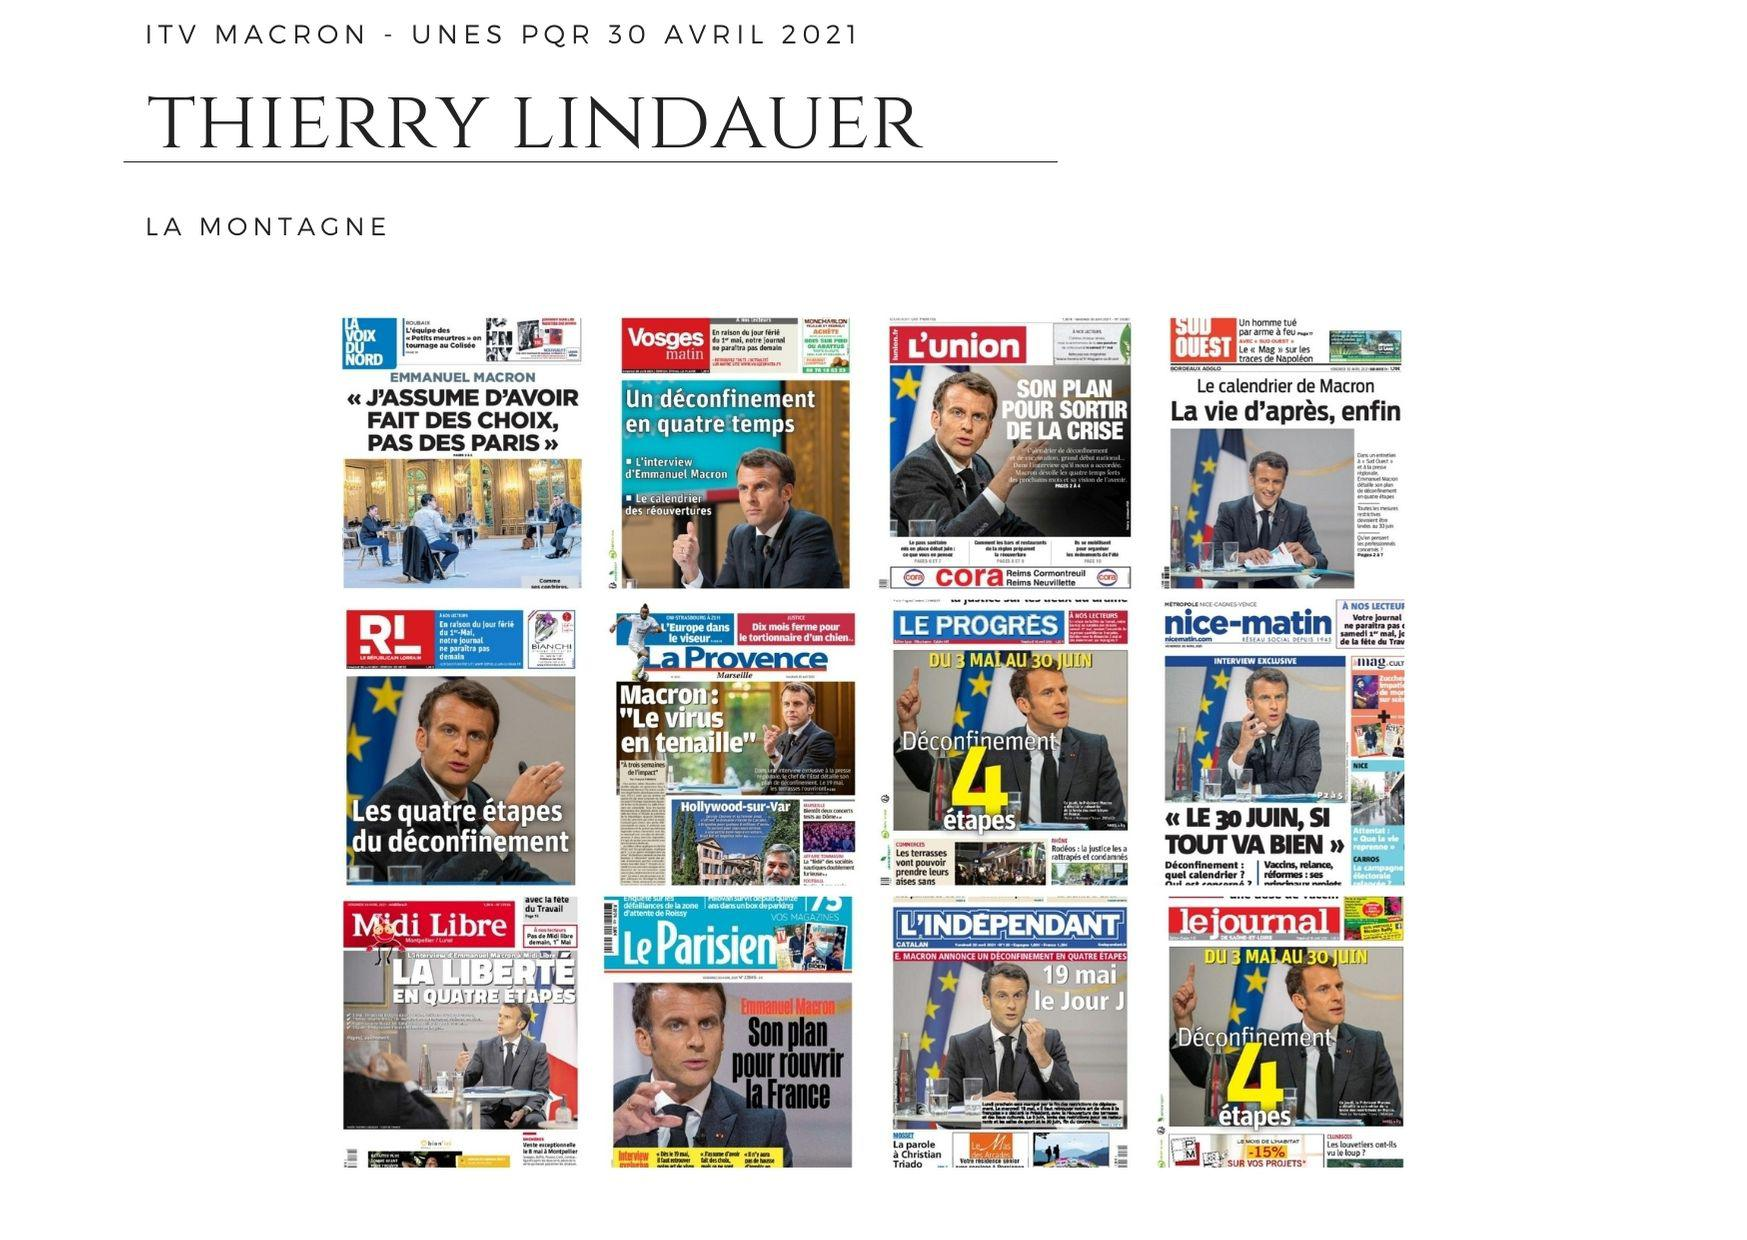 ITV Macron - Unes PQR - 30 avril 2021